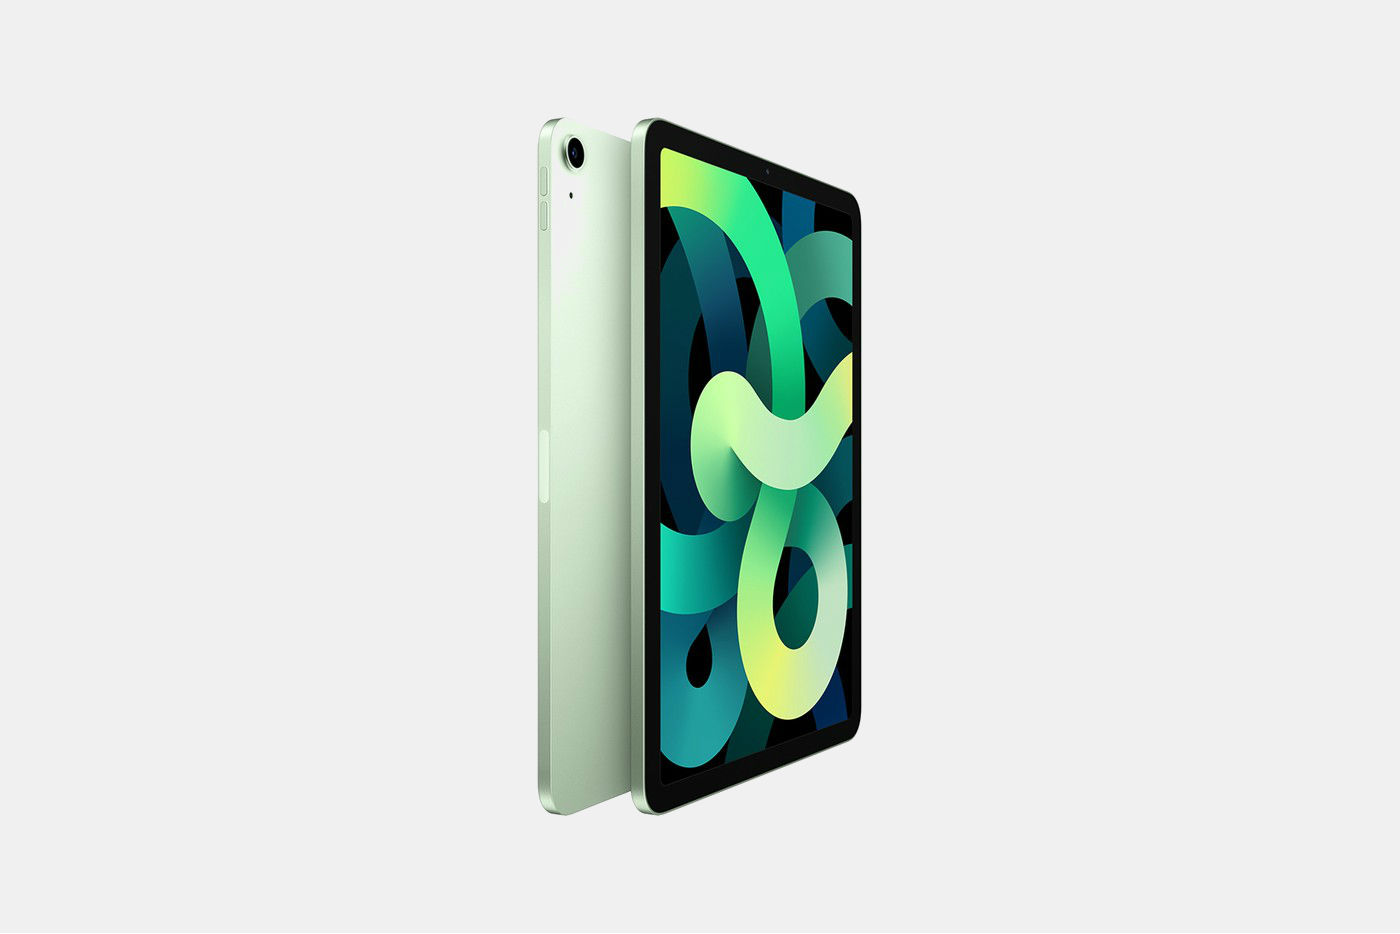 Apple анонсировали выход нового iPad Air